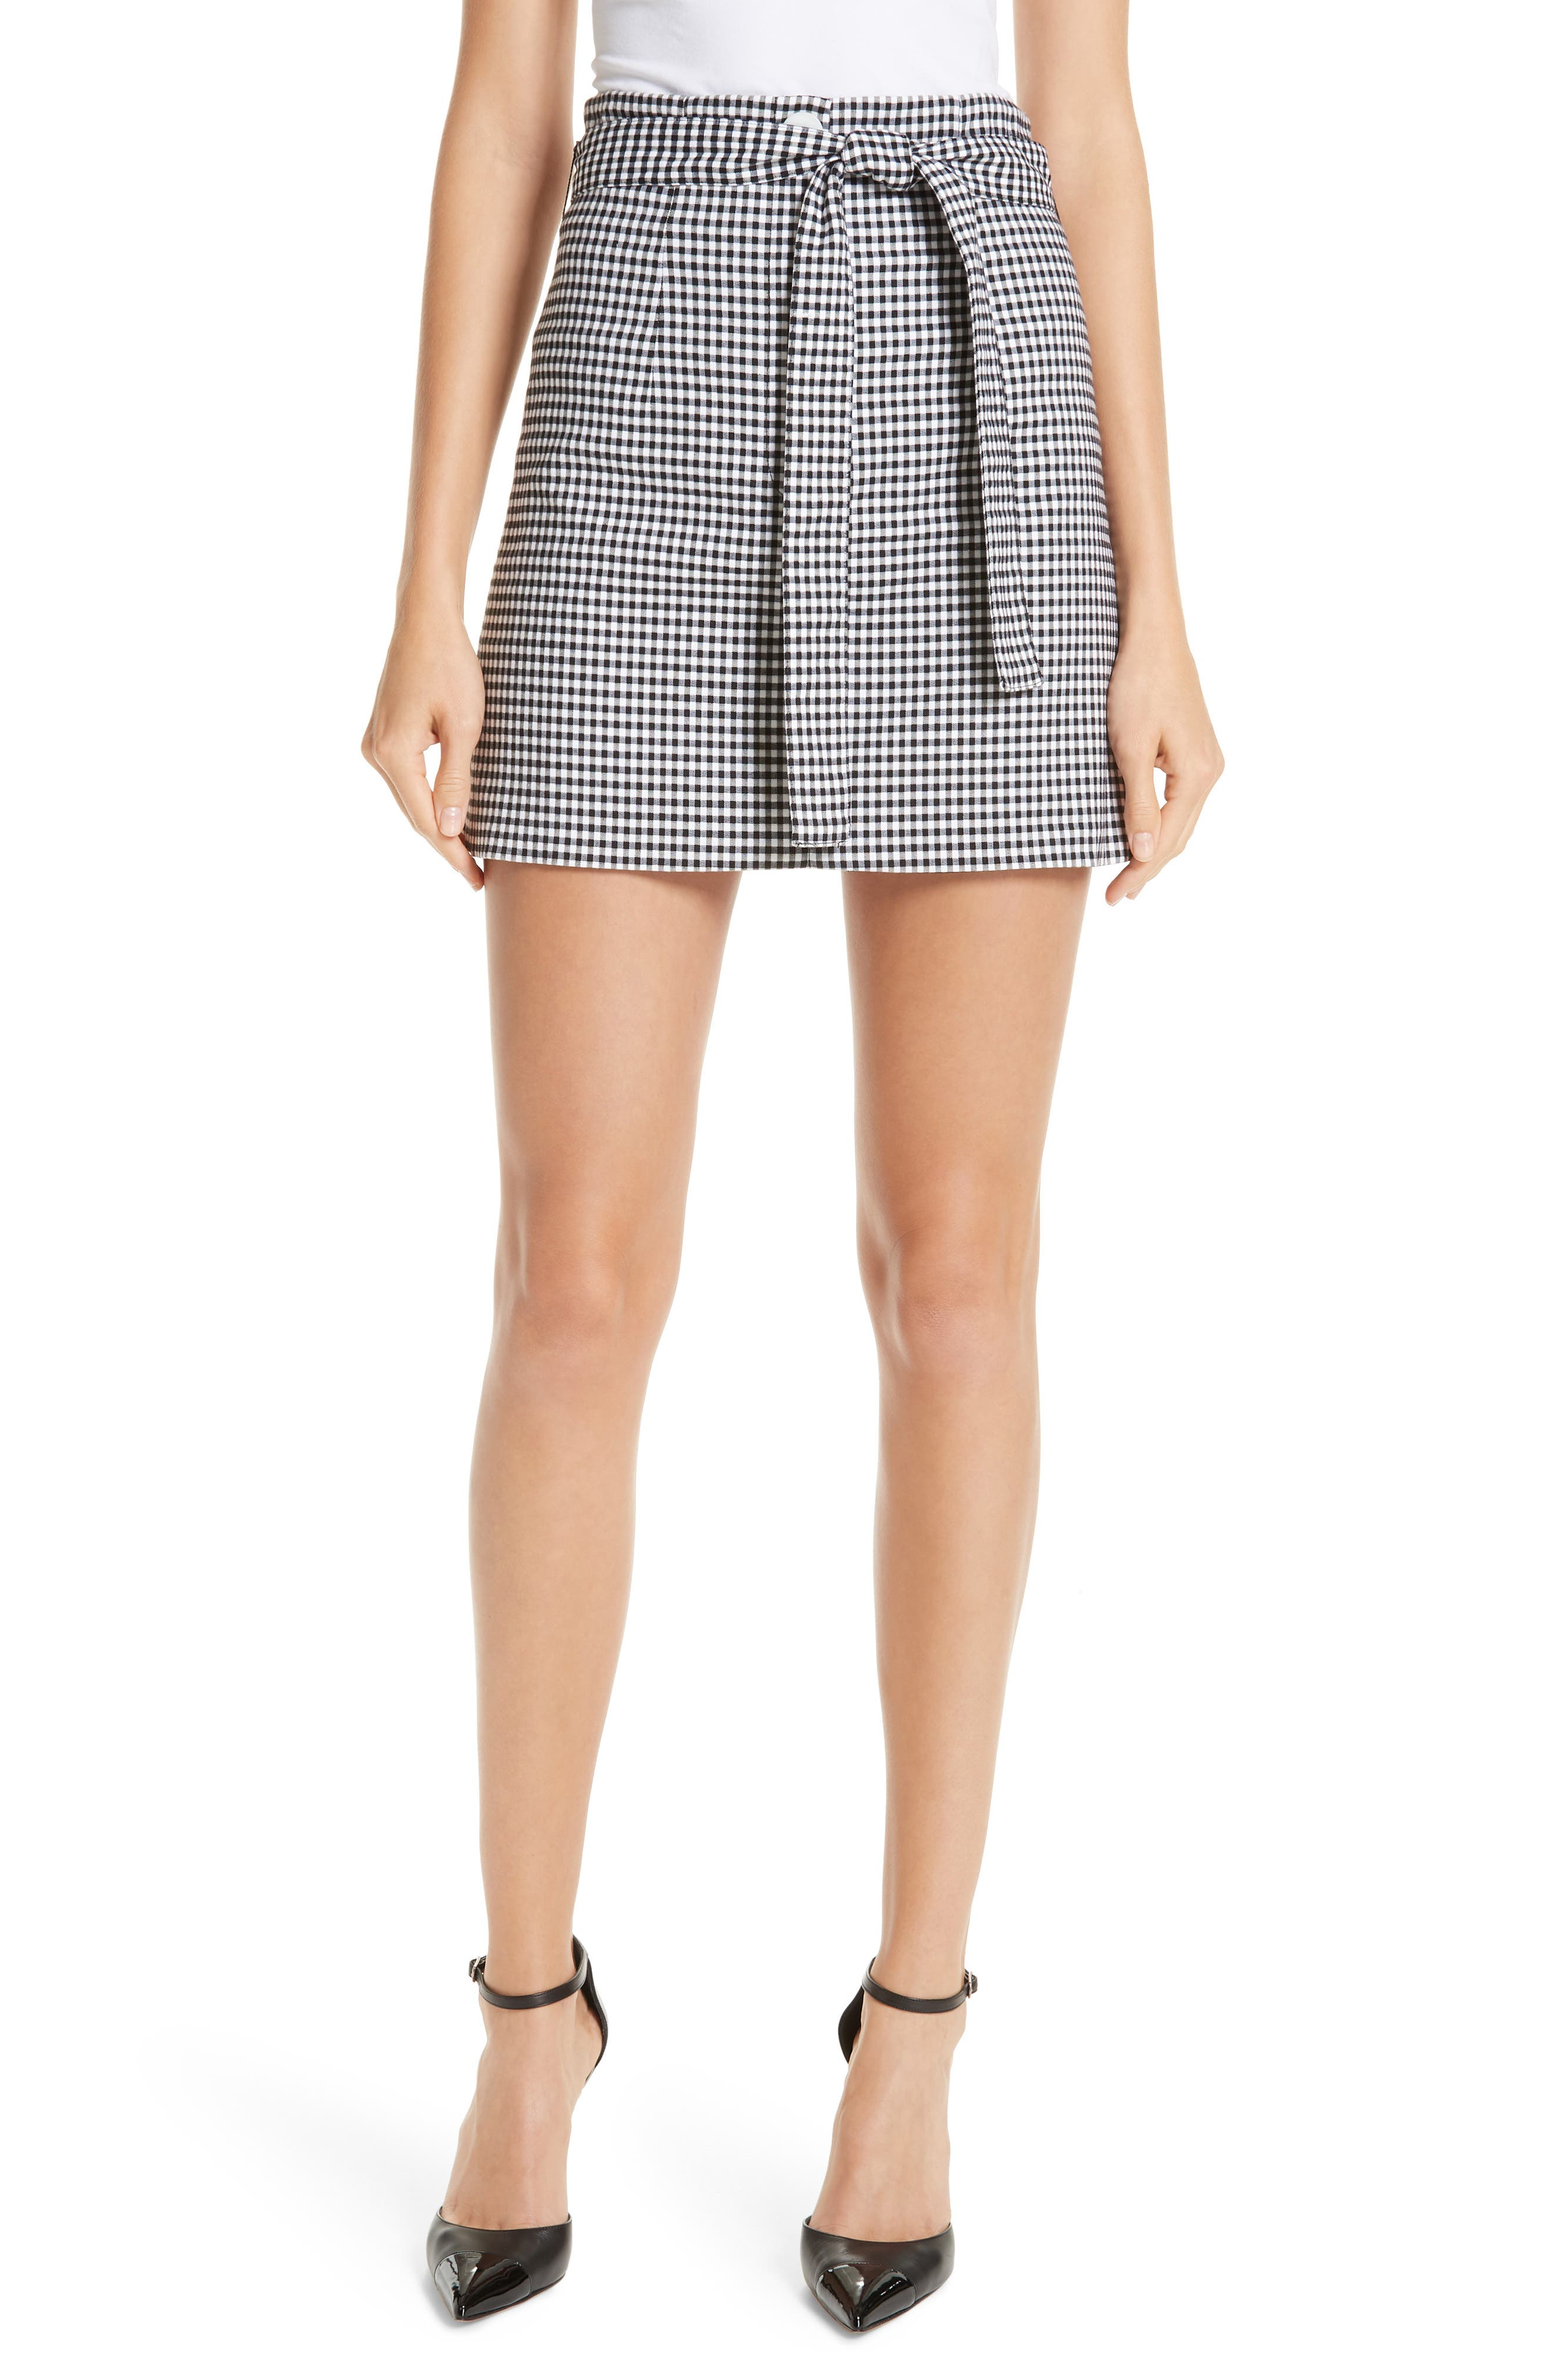 ROBERT RODRIGUEZ Lexy Mini Check A-Line Skirt in Black/ White